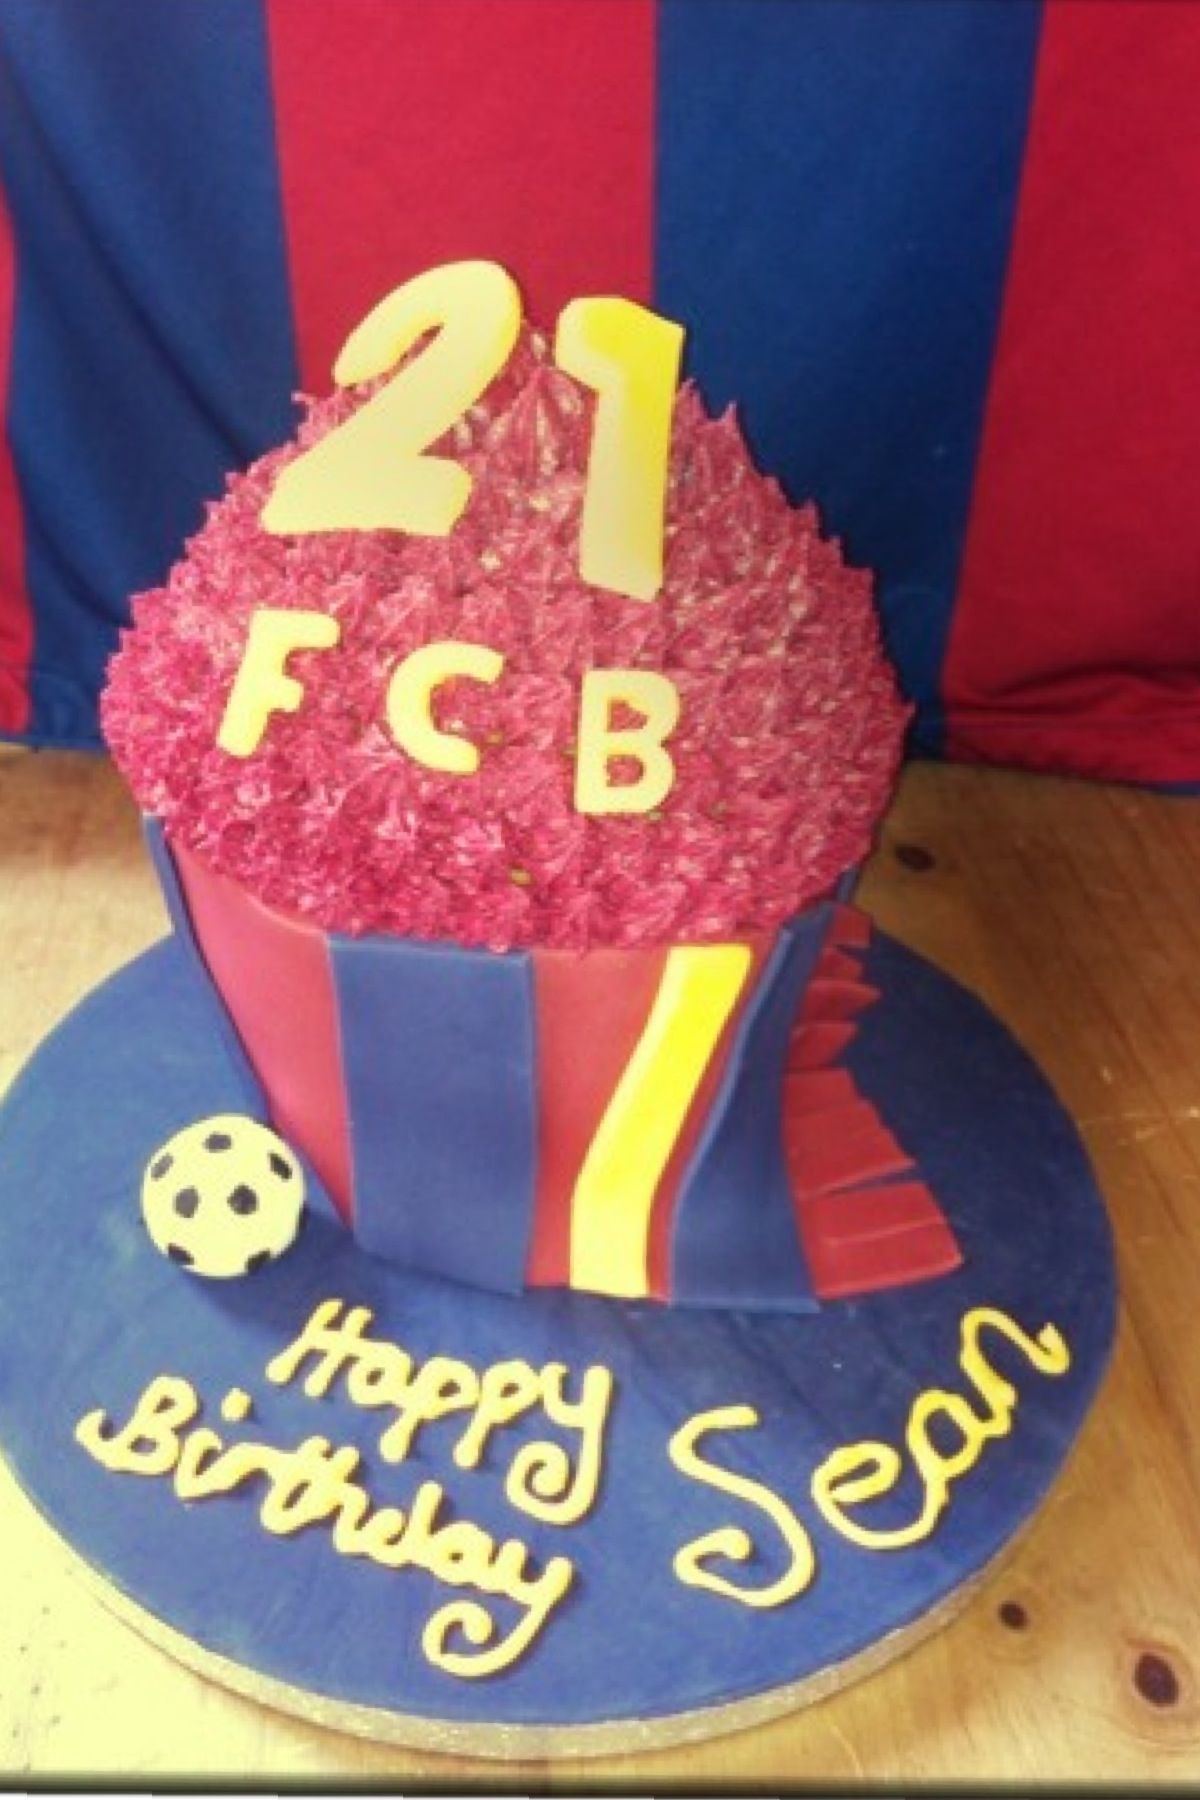 21st birthday Barcelona football cake